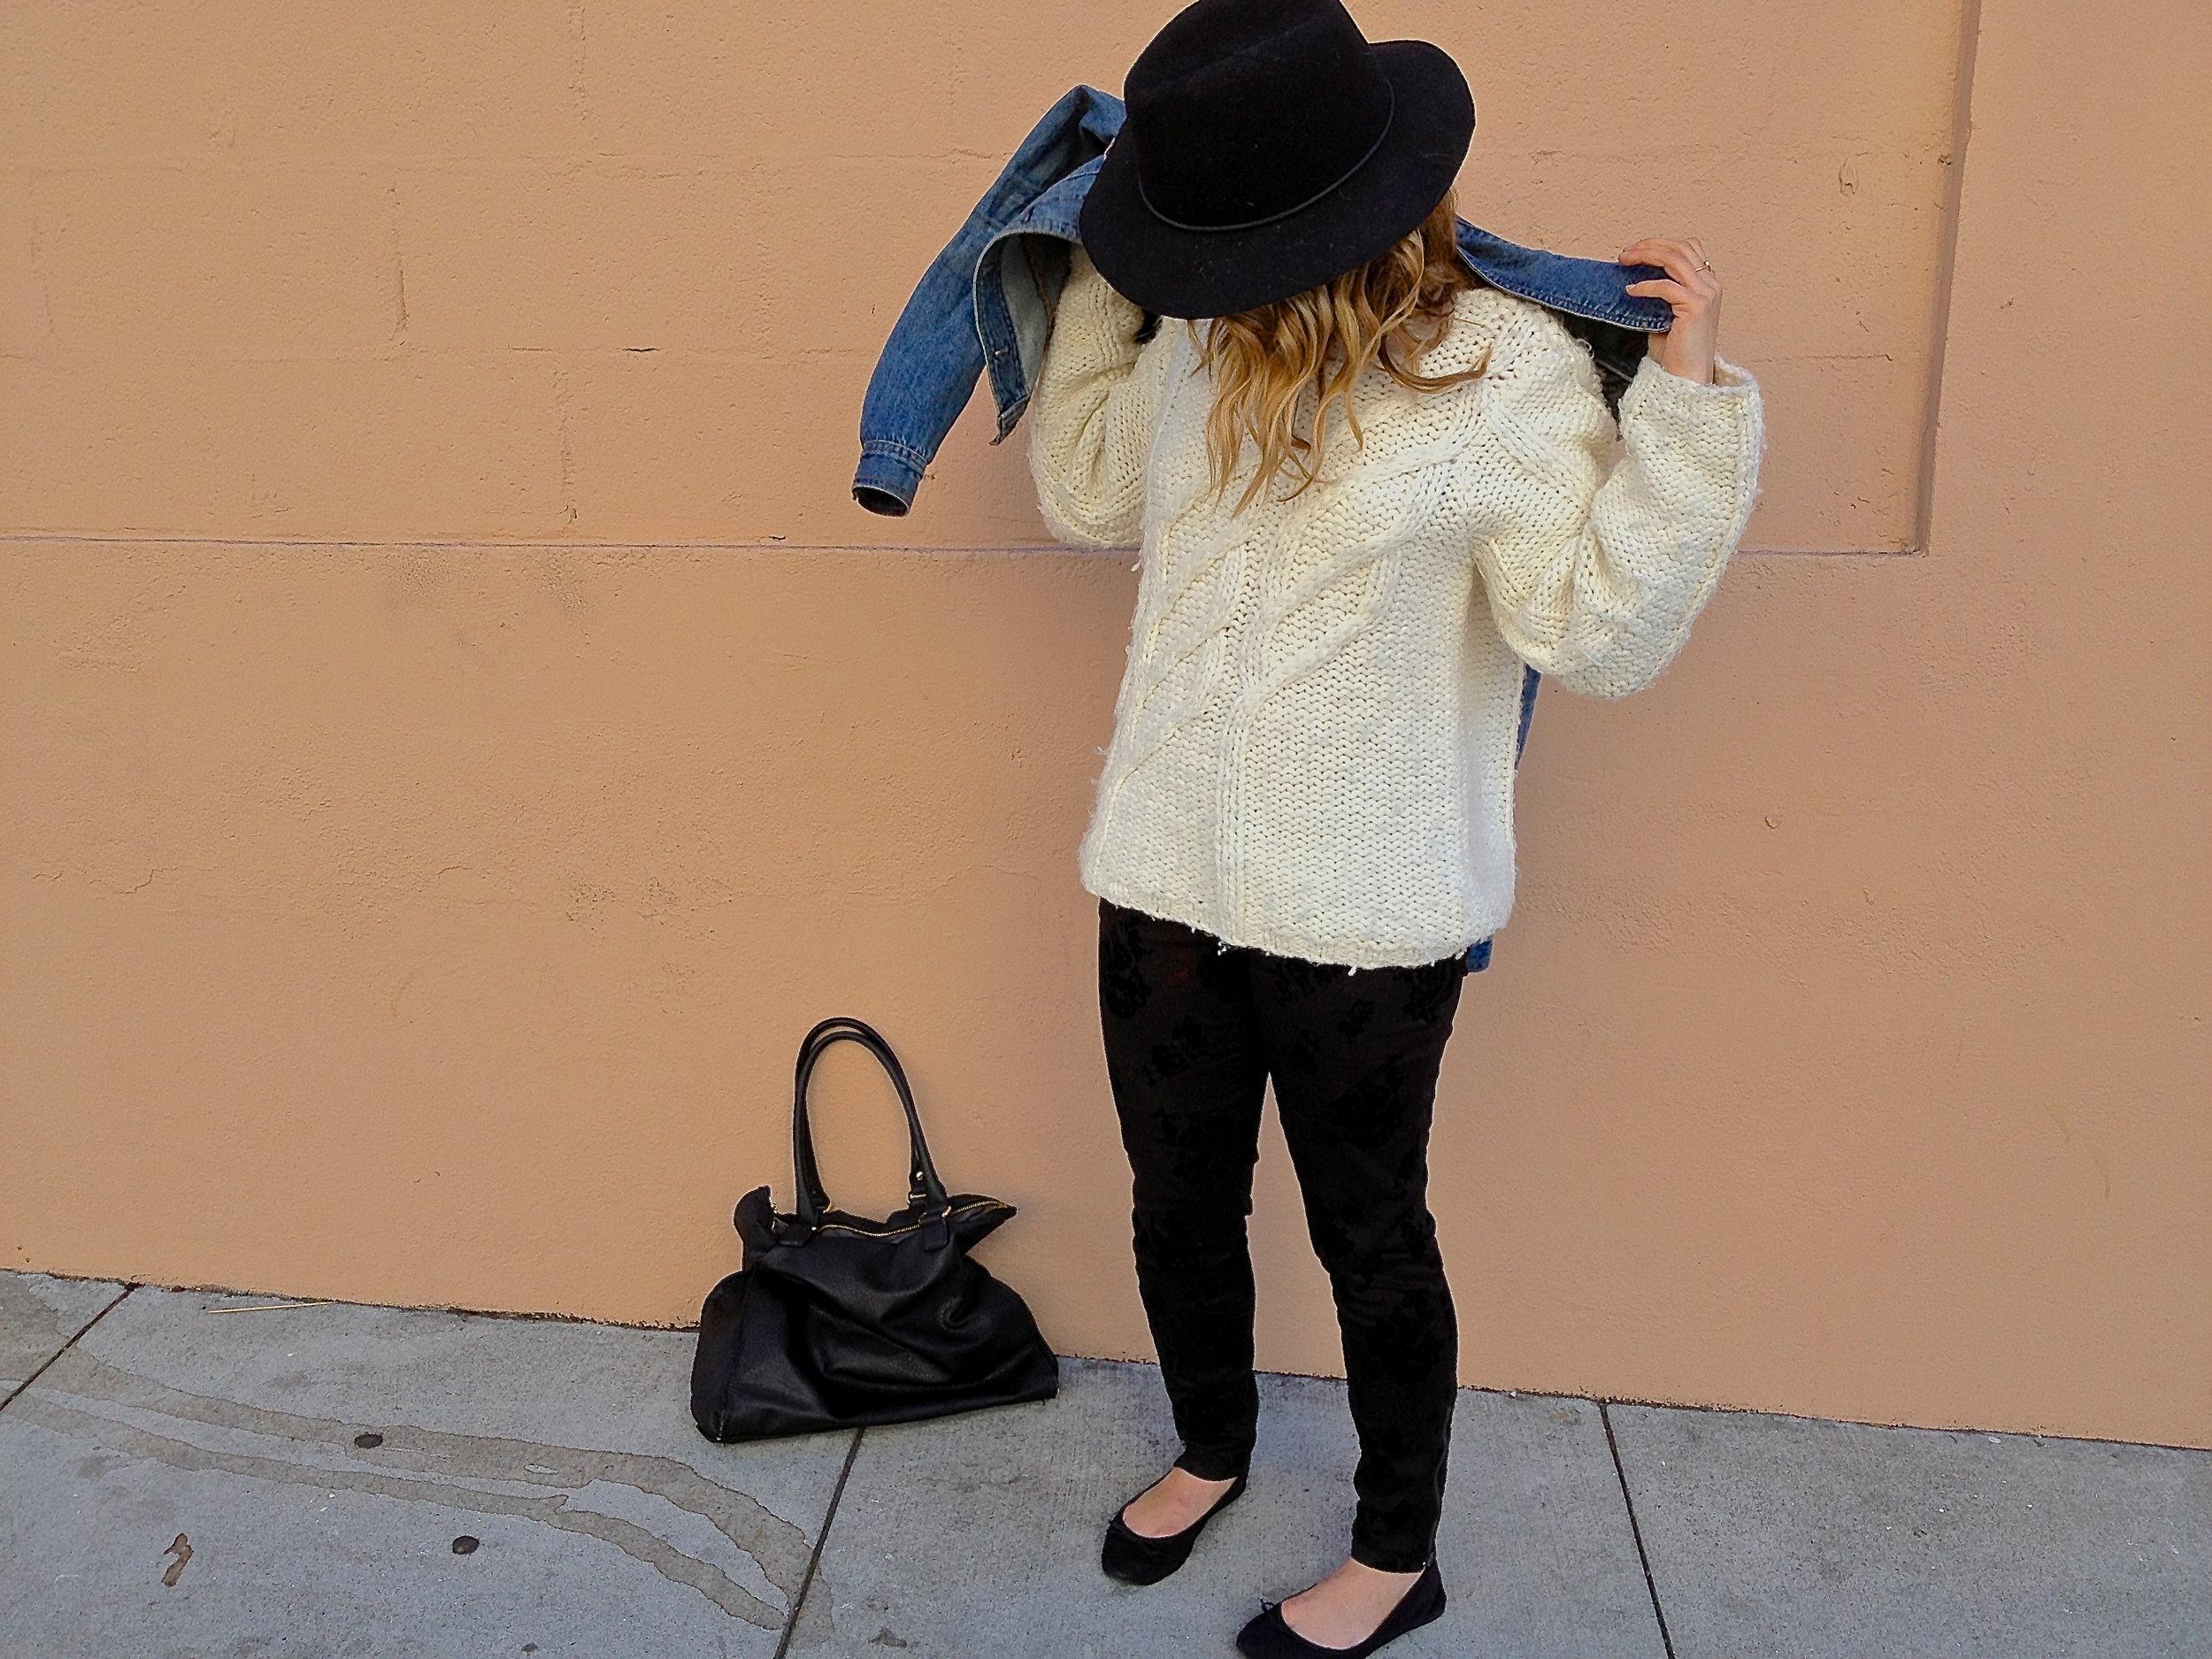 Sweater: Caslon via Andi | Pants: F21 | Hat: Target | Flats: H&M | Bag: Macy's